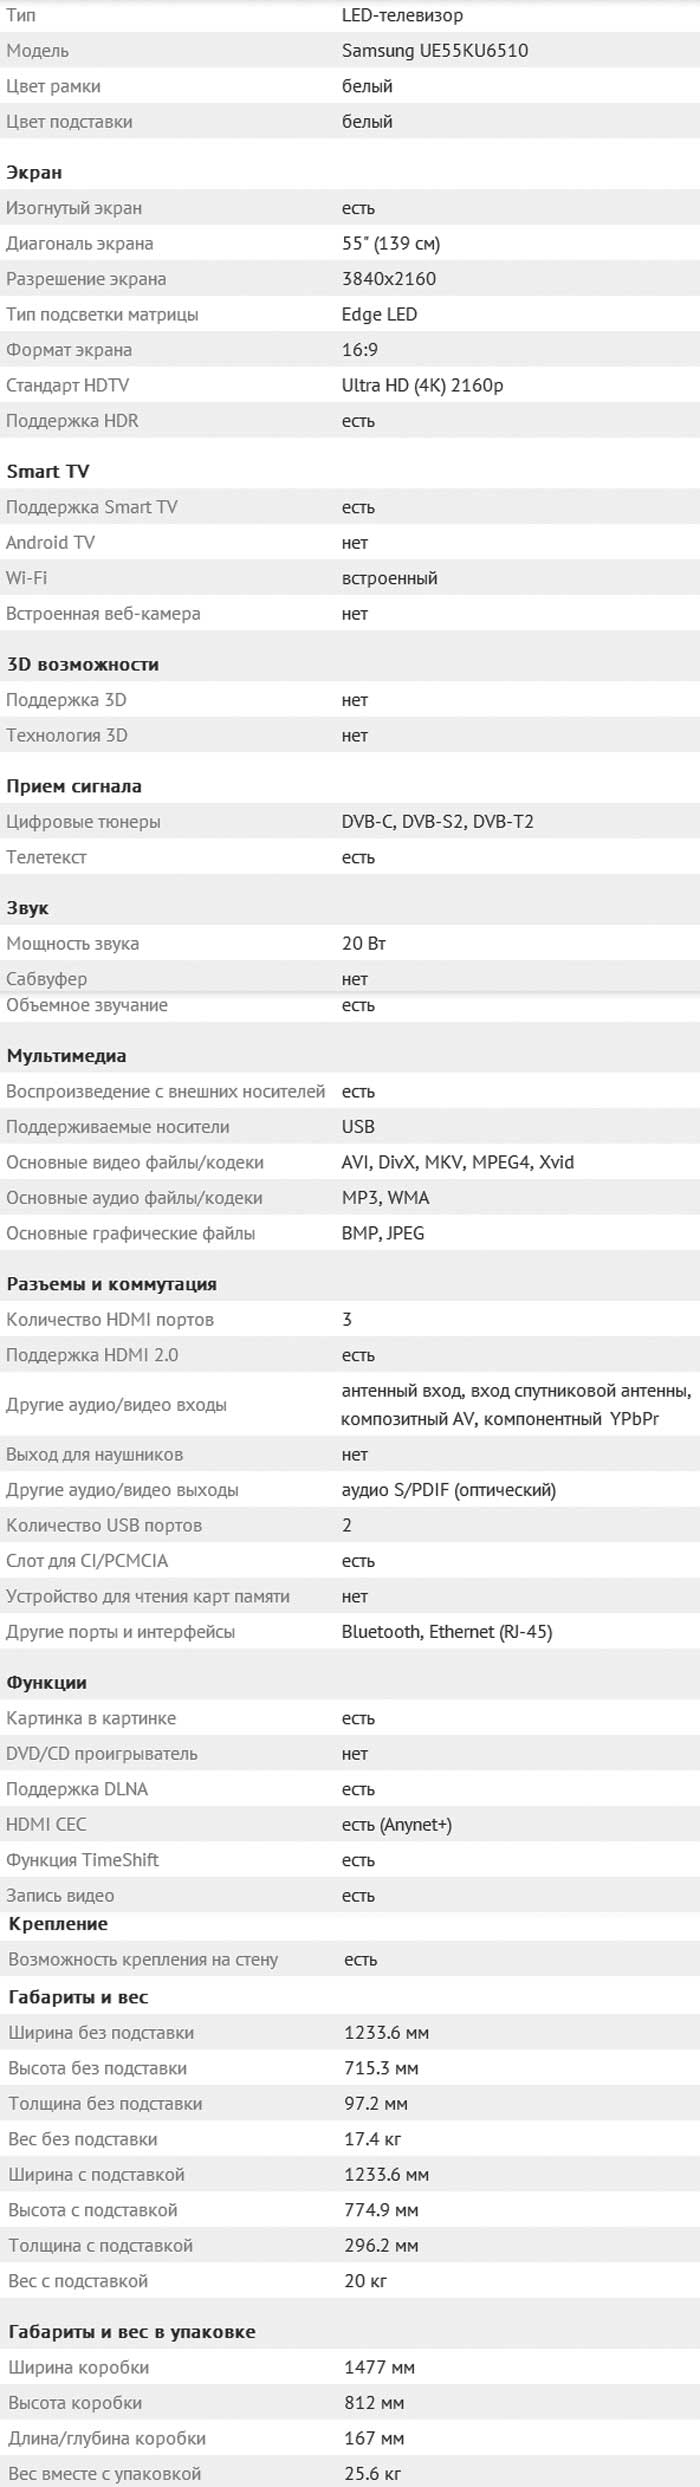 Характеристики 55KU6510U